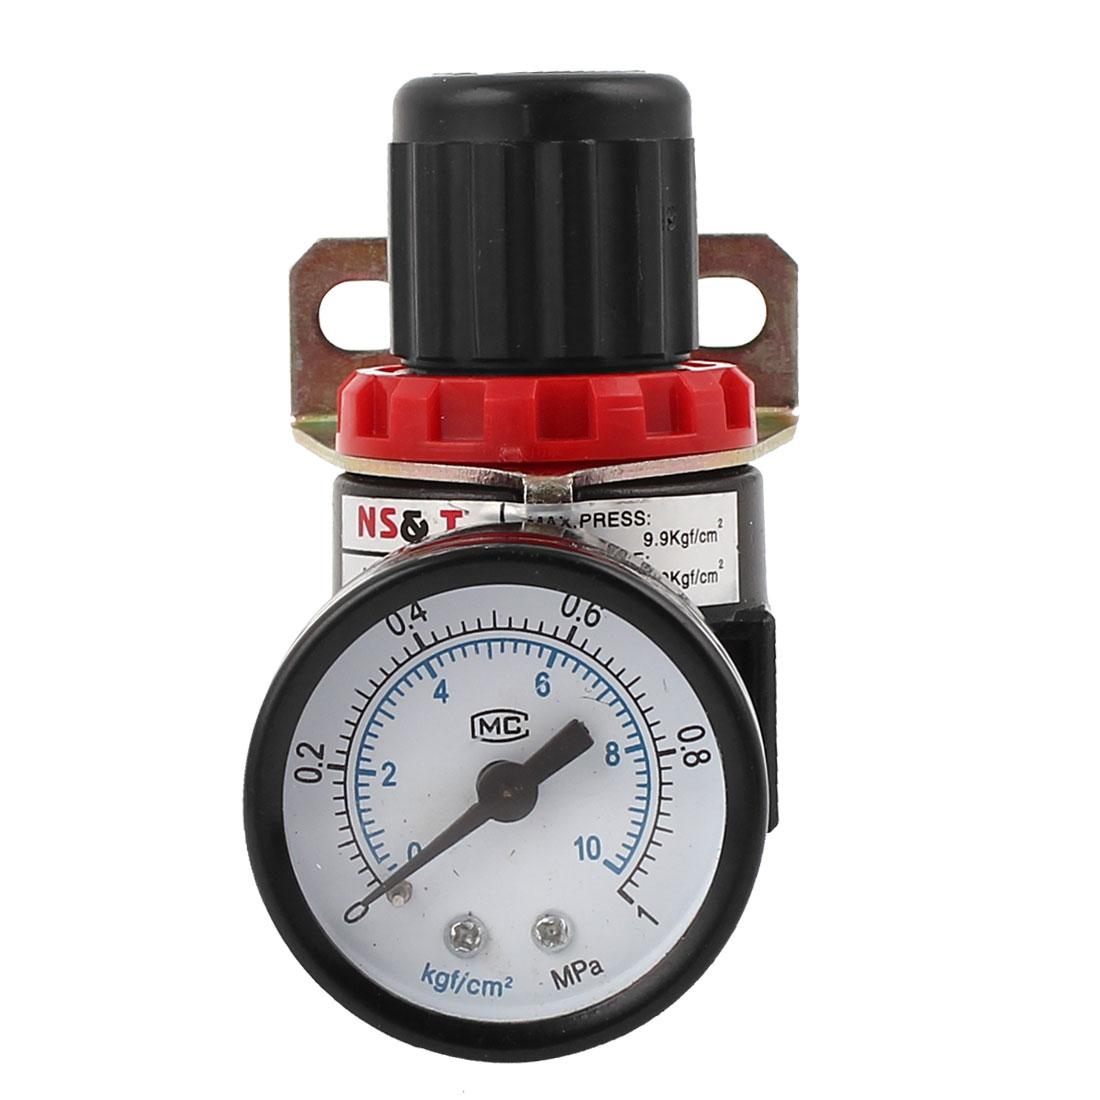 "AR2000 Adjustable Pressure Metal Pneumatic Regulator 1/4"" w Pressure Gauge"